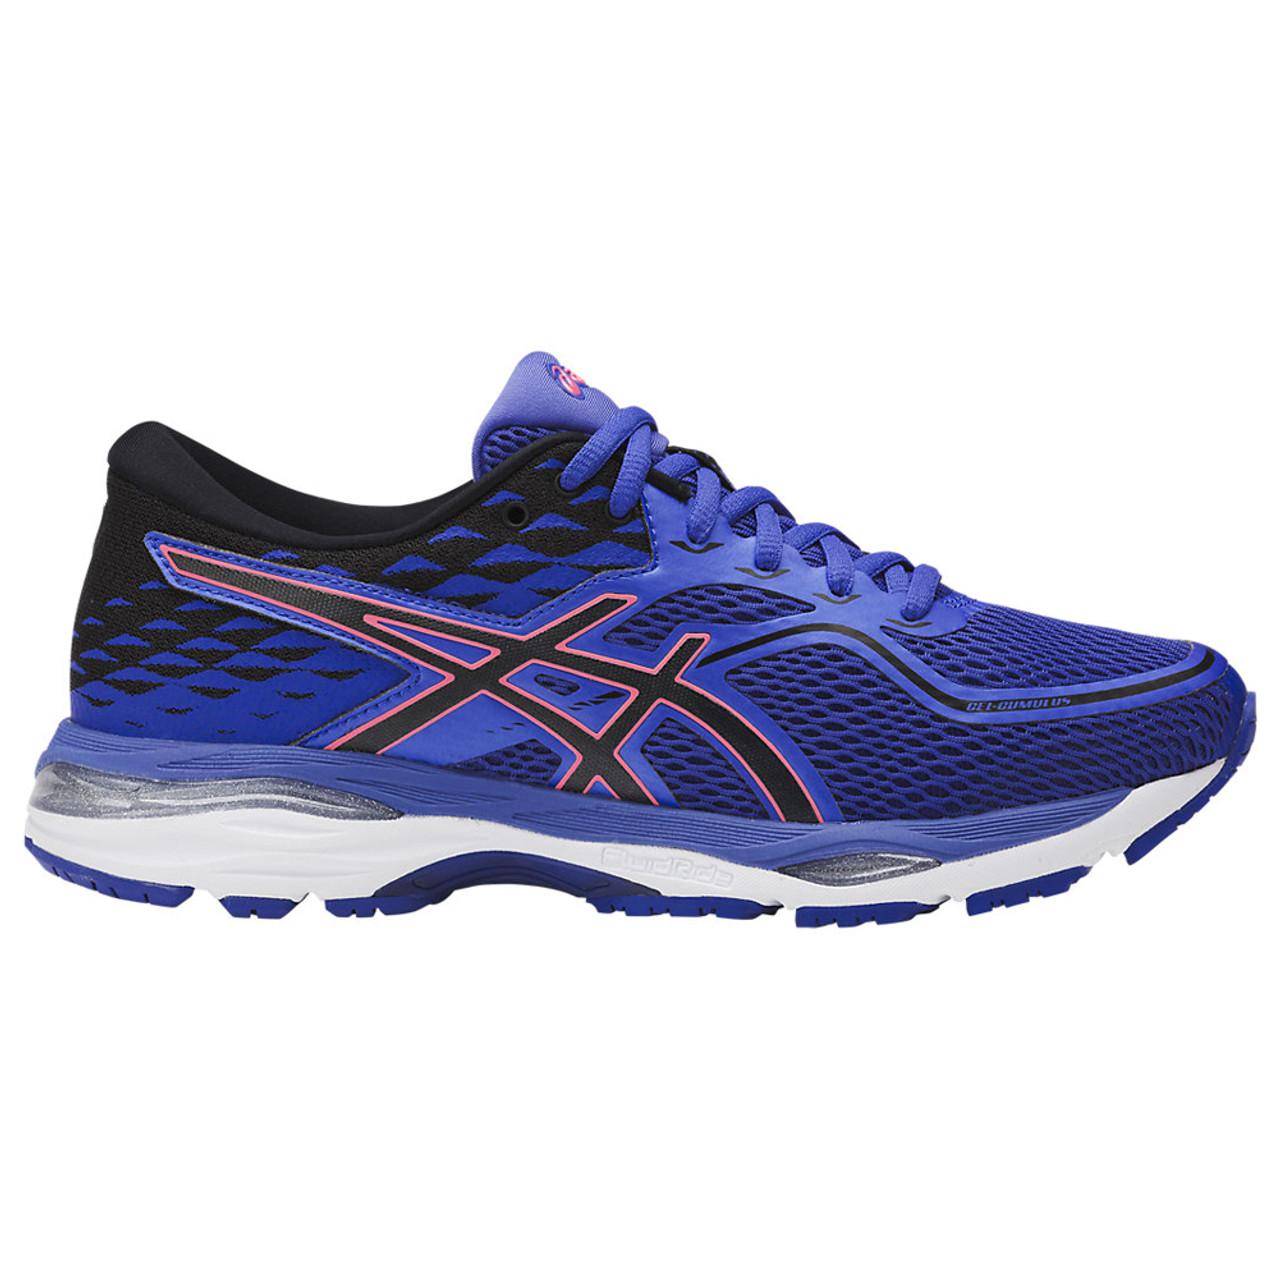 Asics Women s GEL-Cumulus 19 Running Shoe Blue Purple Black Flash Coral - 23c442e82ab